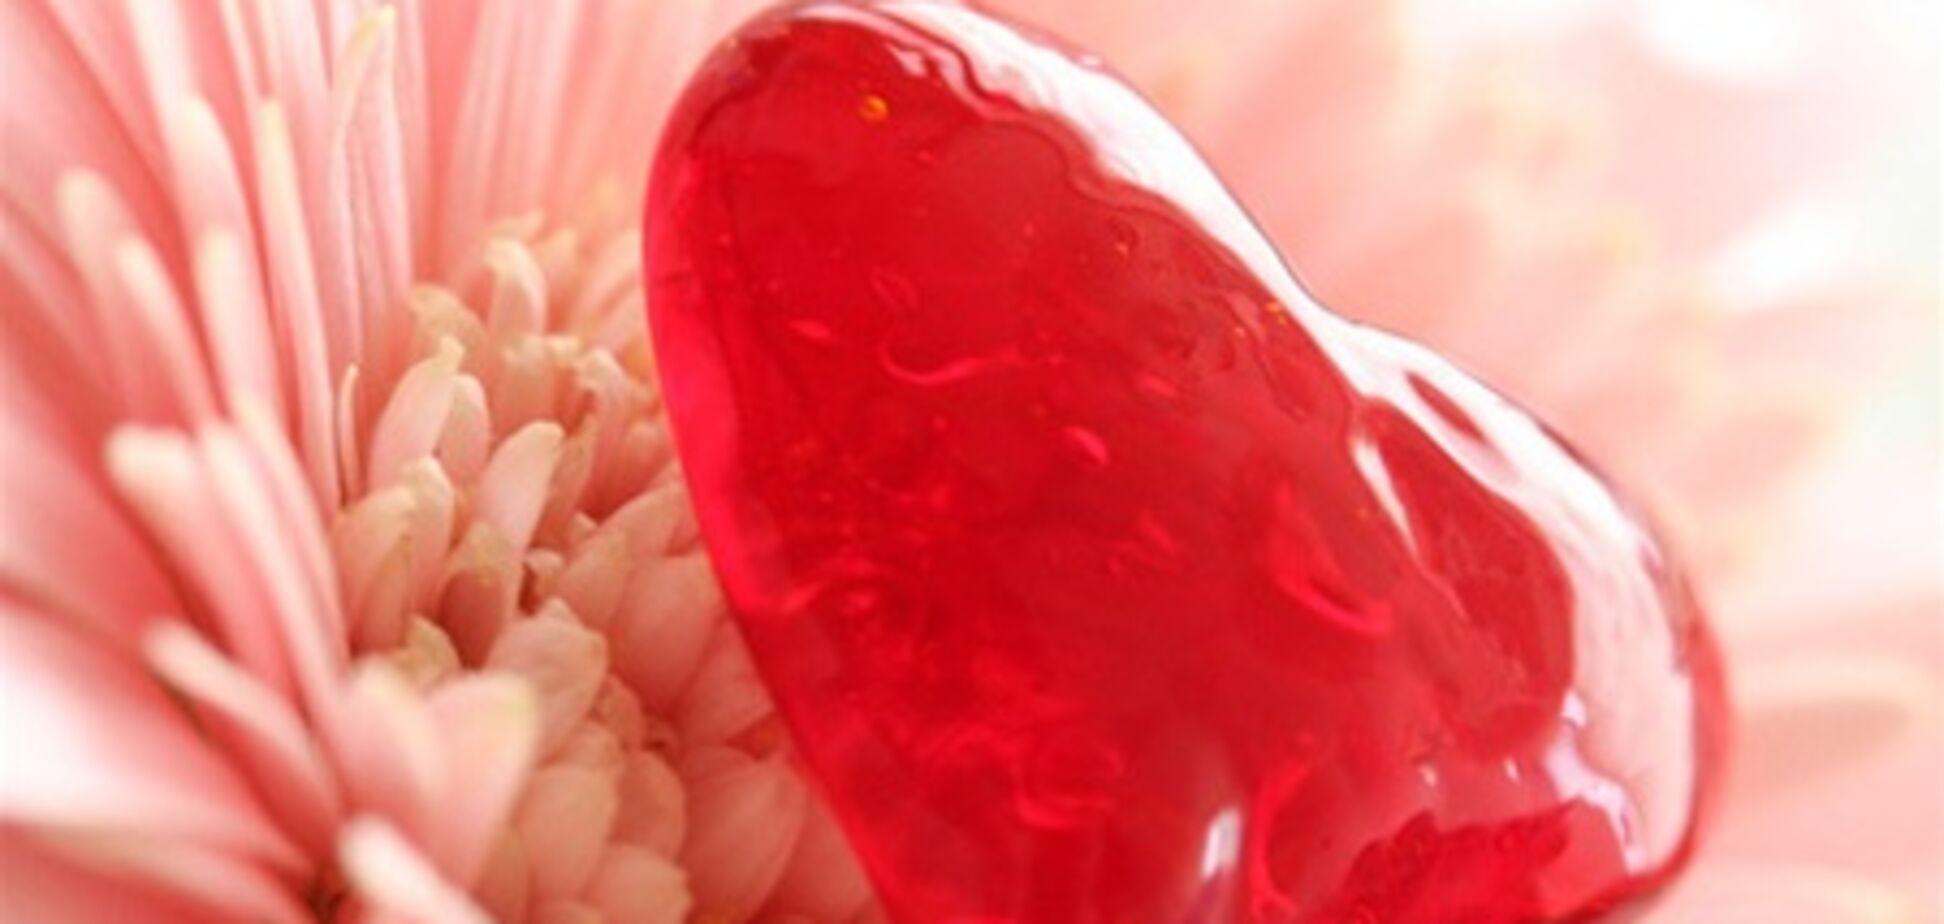 У День закоханих в Україні сталося багато незвичайного